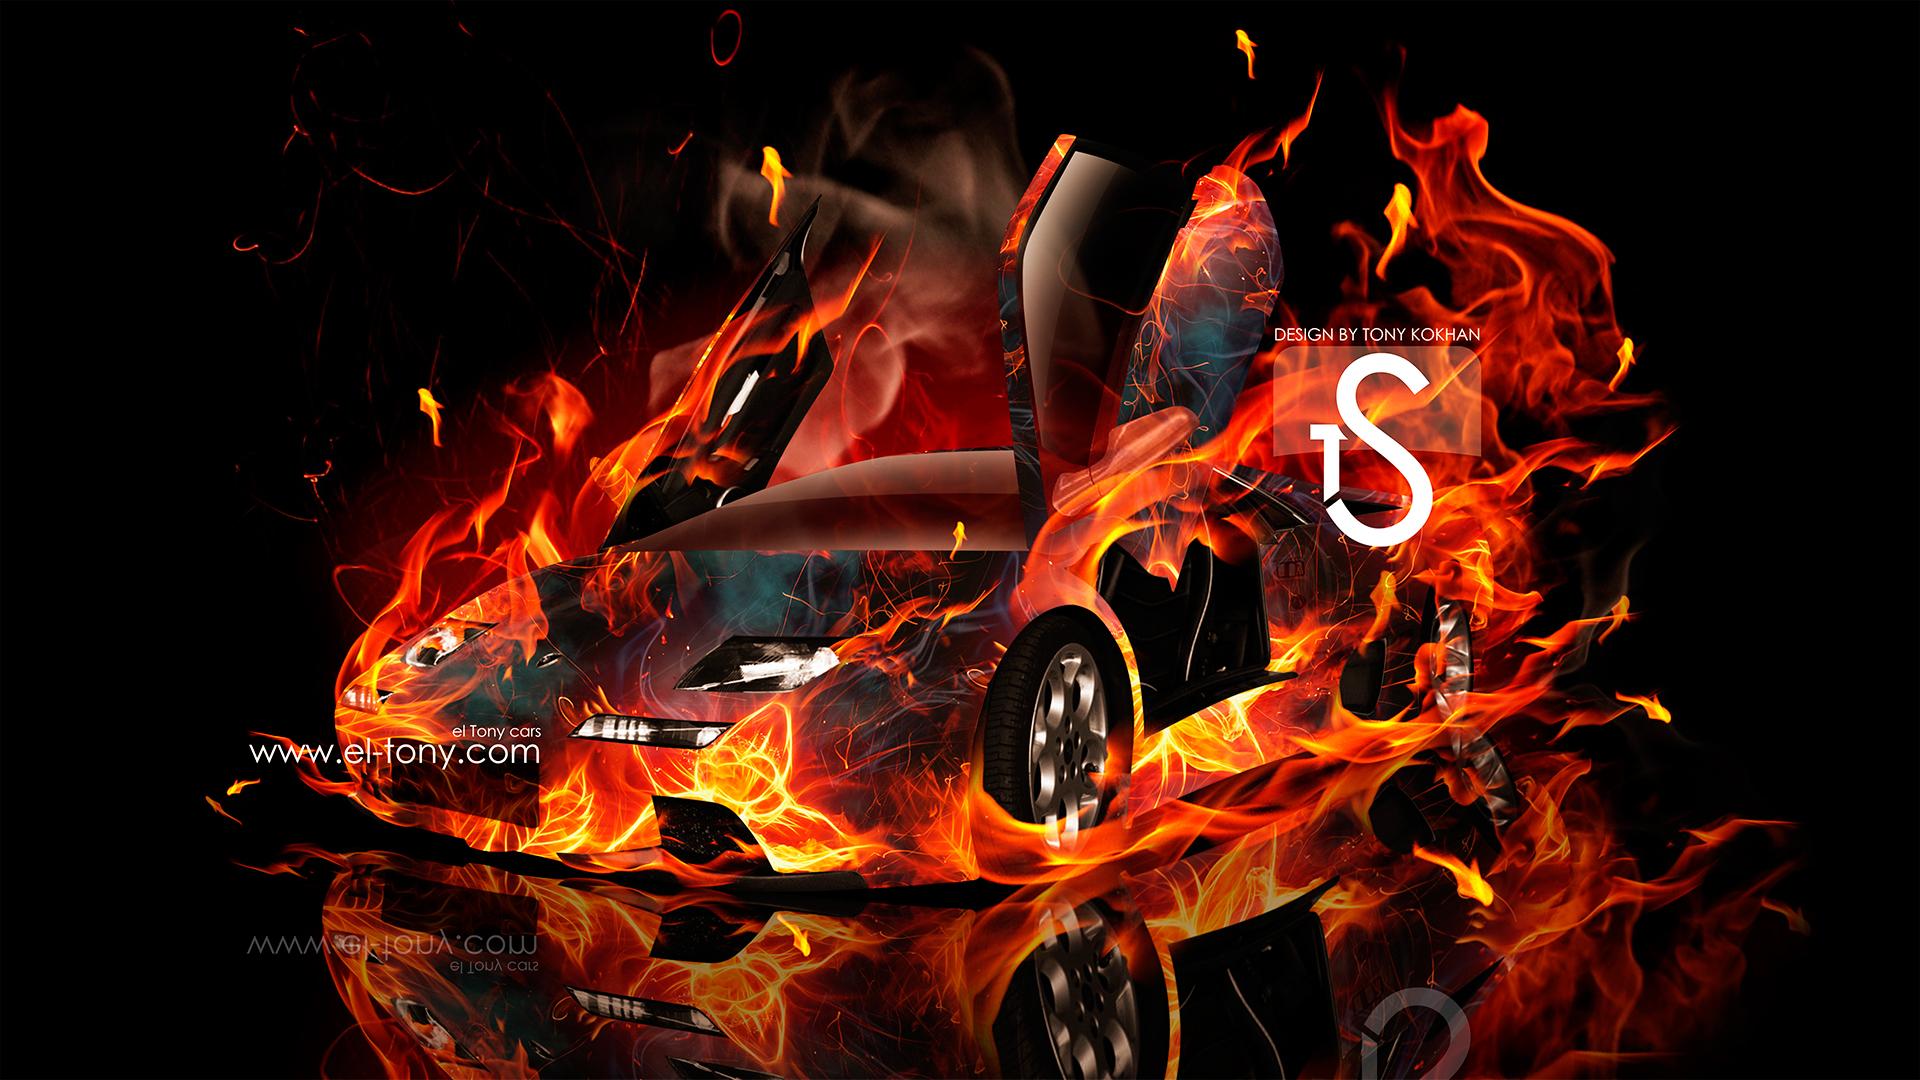 Lamborghini aventador side fire abstract car 2014 hd wallpapers design - Lamborghini Diablo Fire Car Speed Abstract 2013 Hd